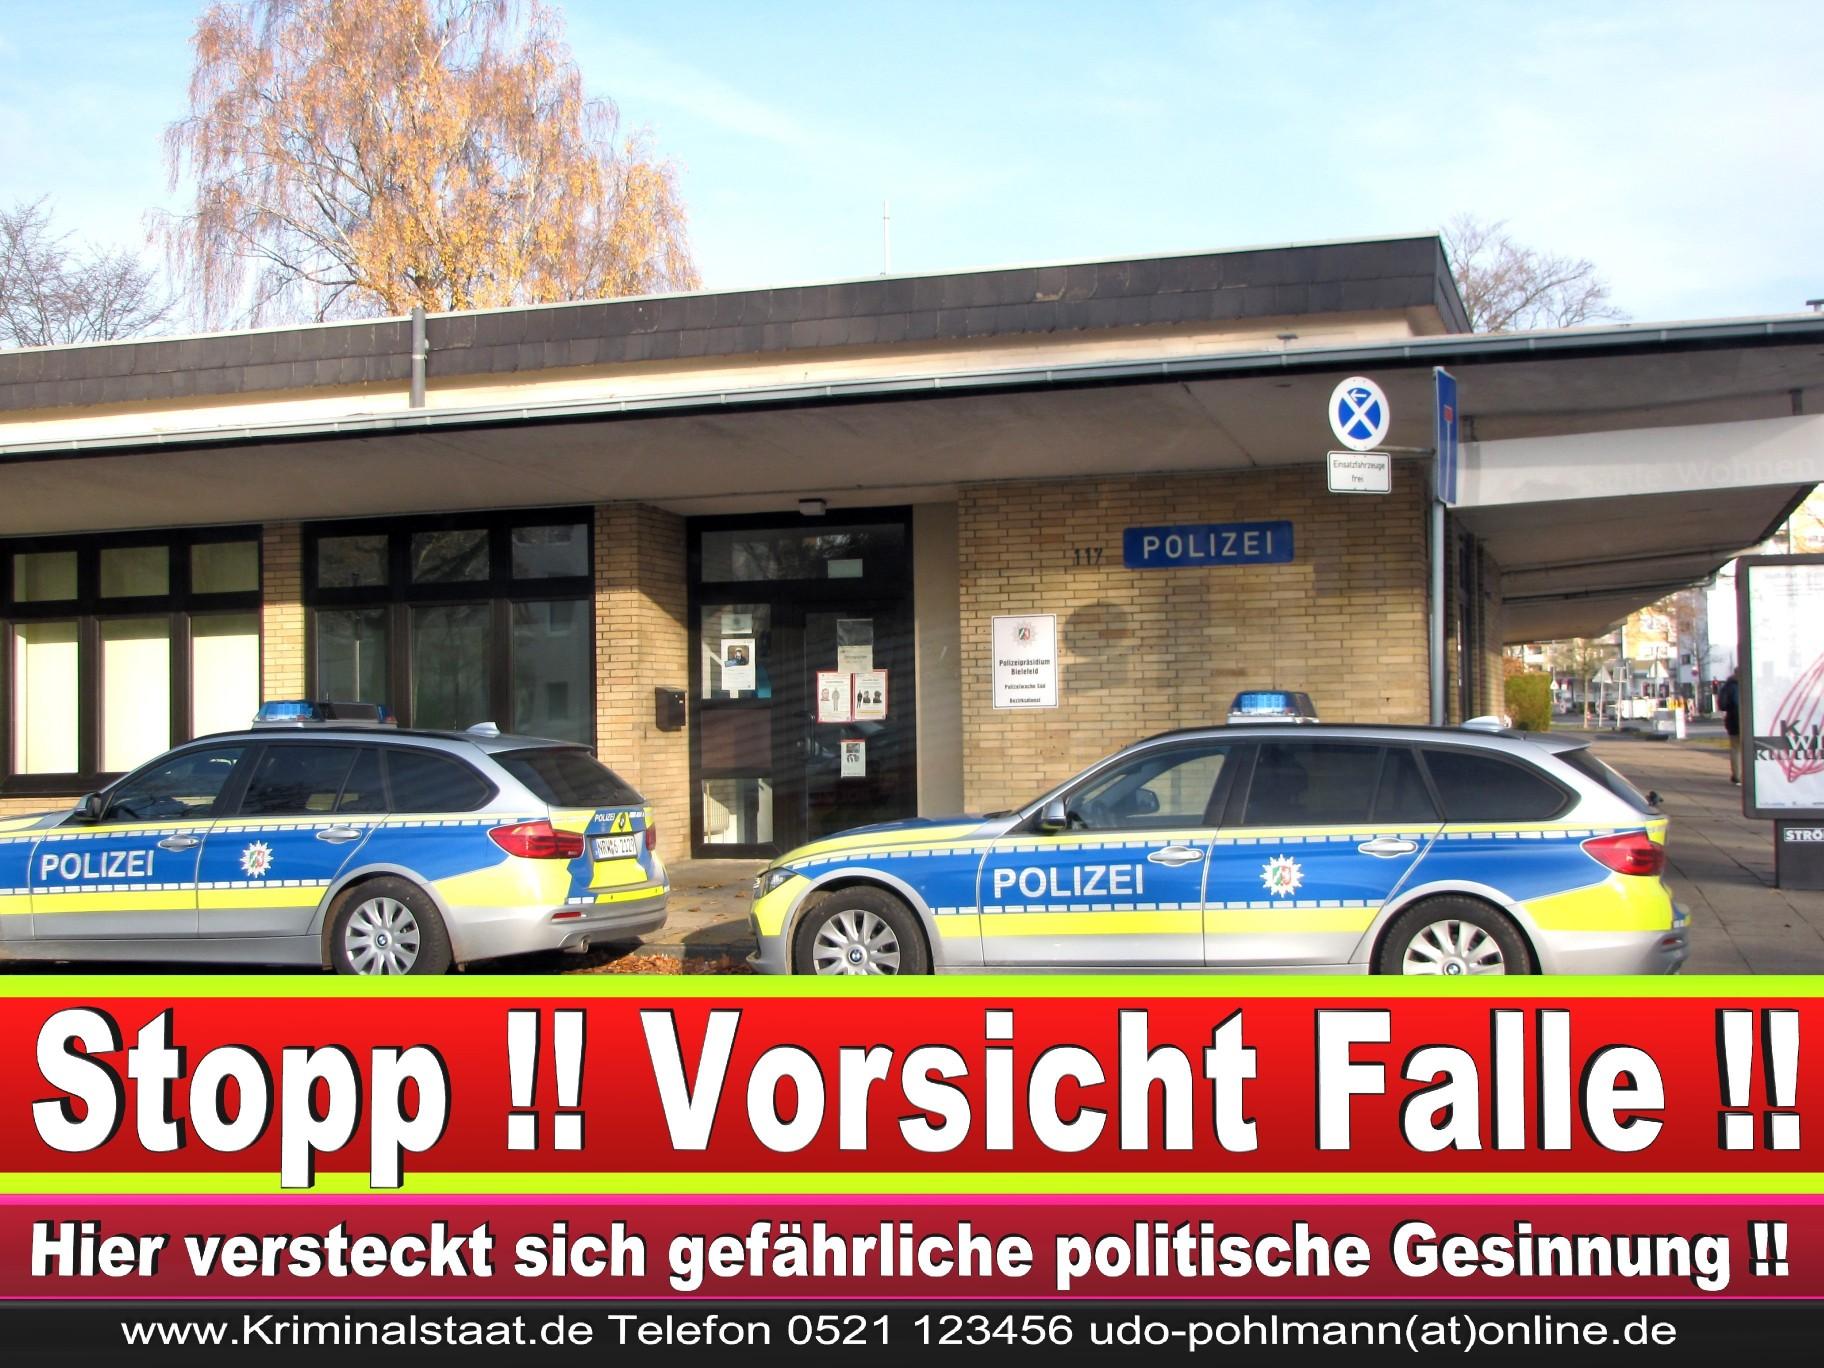 Polizei Bielefeld Sennestadt Günter Vullhorst Korruption Öko Tech Park 17 07 (9)